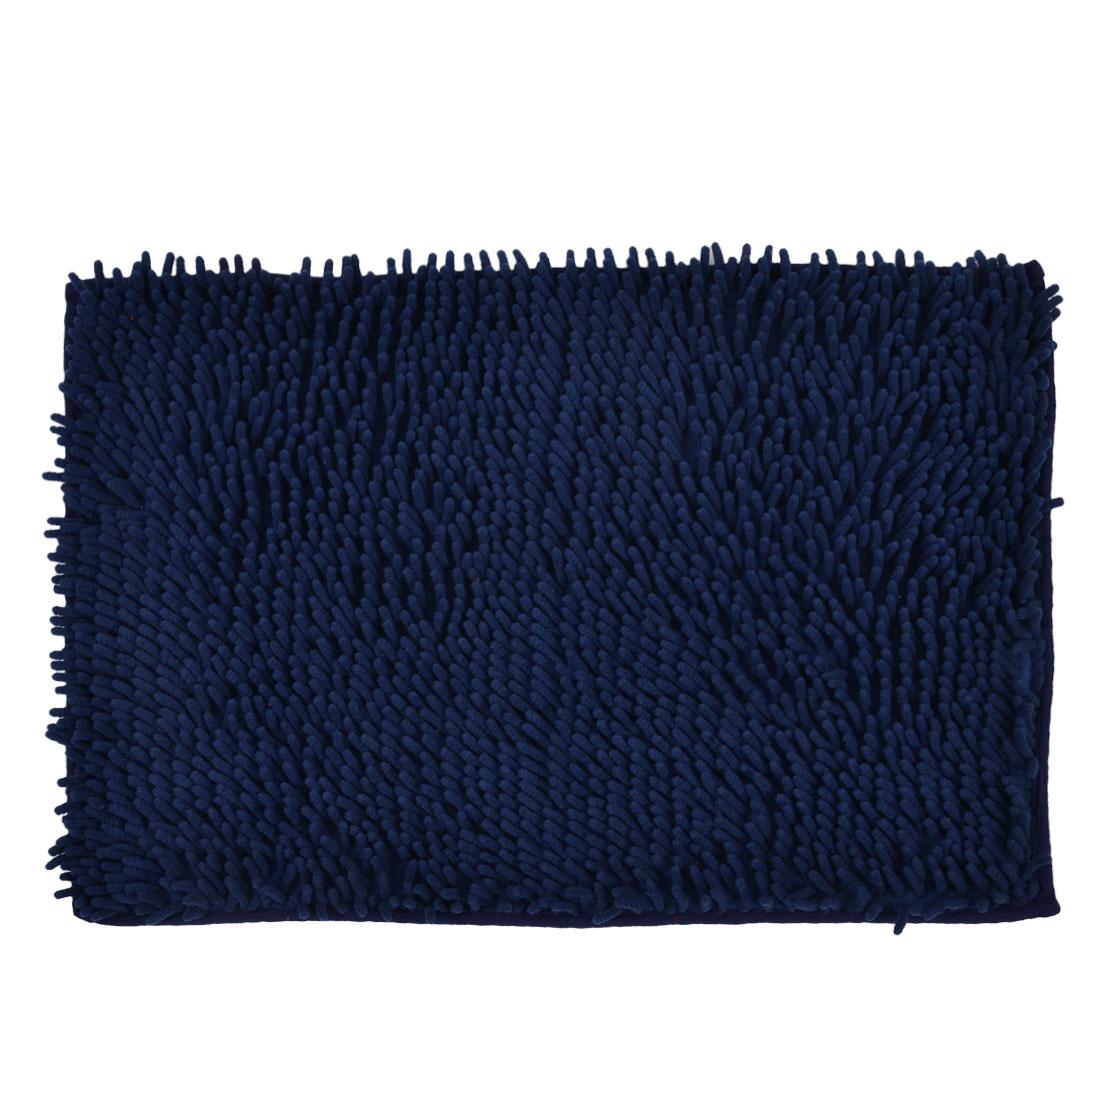 60cm x 40cm Dark Blue Polyester Rectangle Absorbent Non-slip Pad Bath Mat Shower Rug